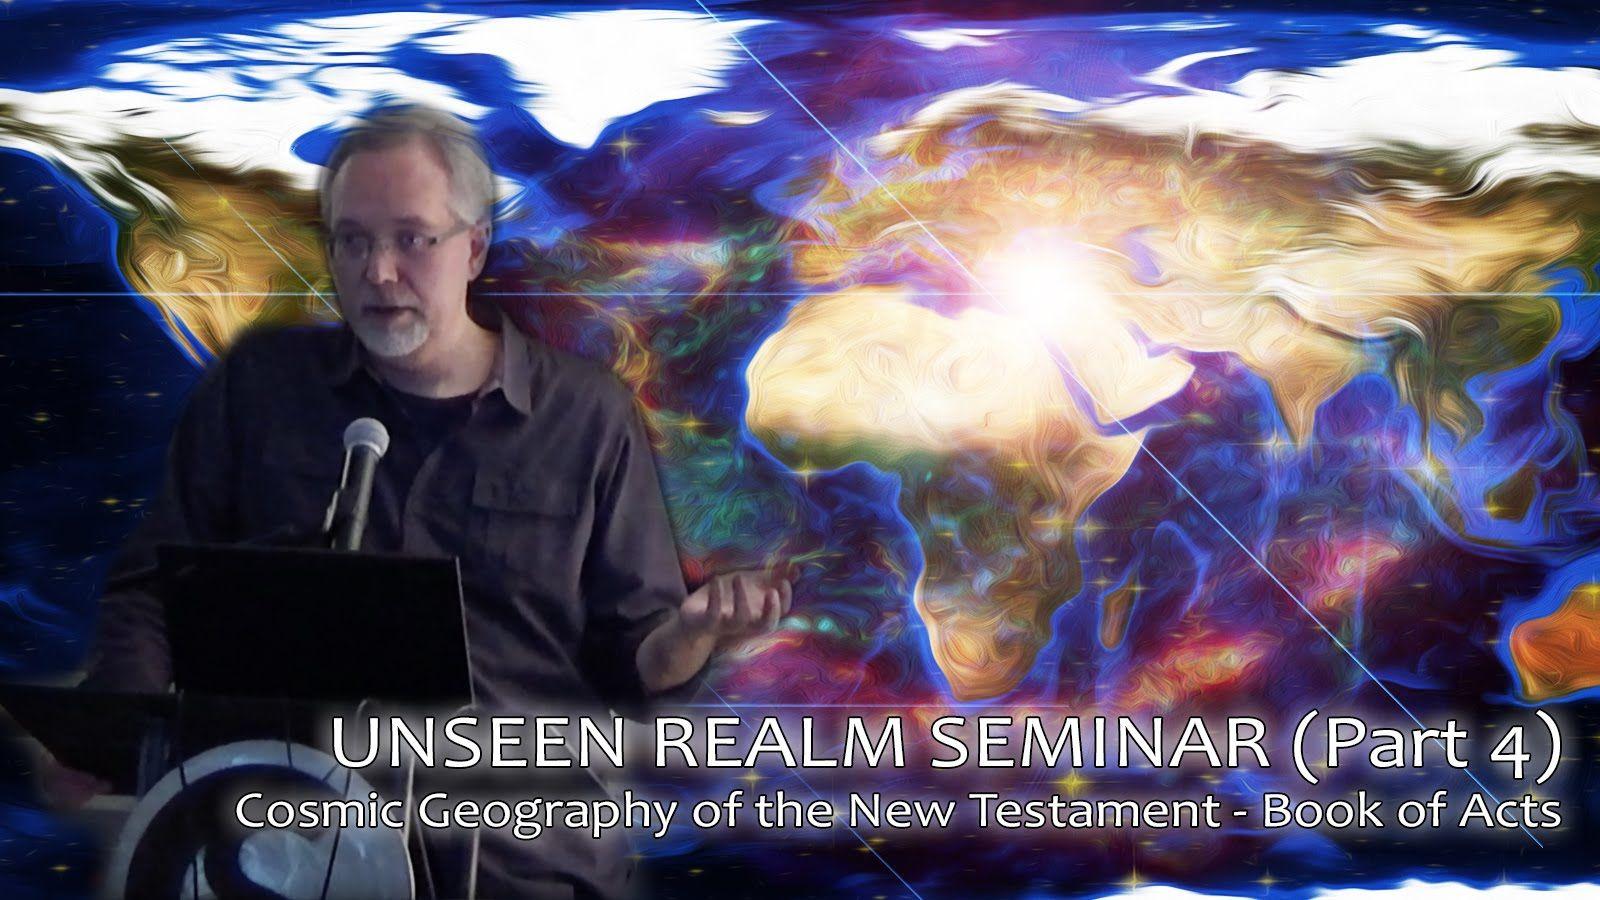 P t 4] UNSEEN REALM SEMINAR w/ Dr  Michael S  Heiser: Cosmic